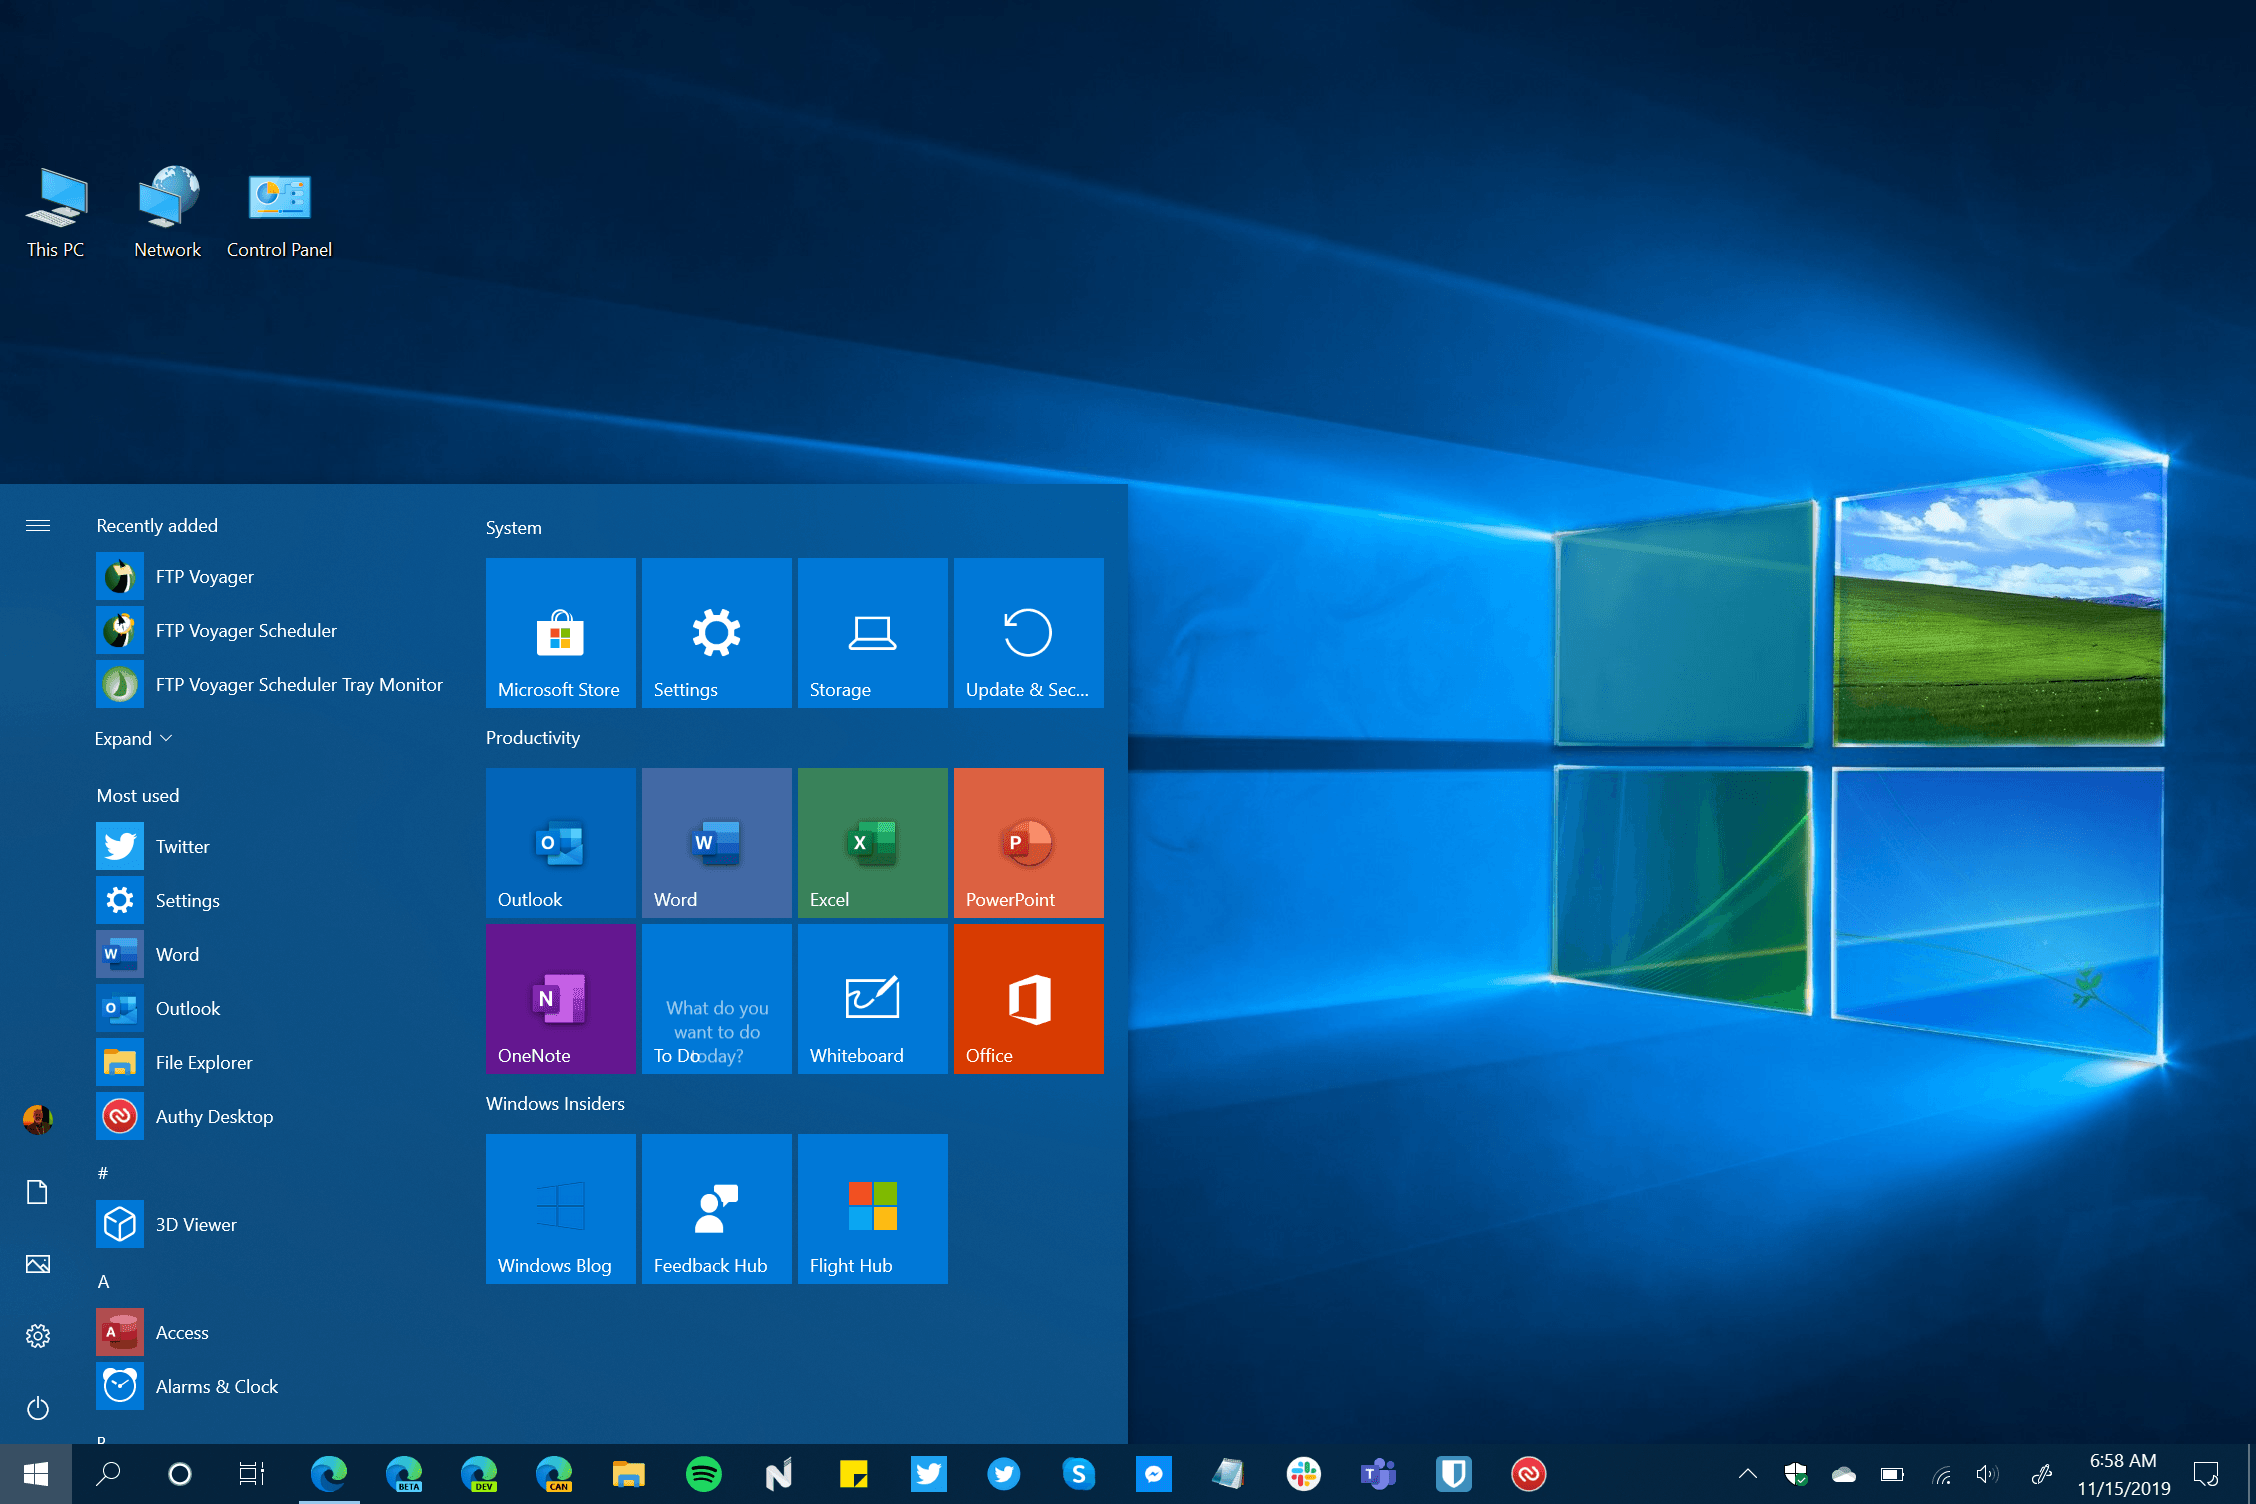 Windows 10 Version 1909 Start Menu and Desktop